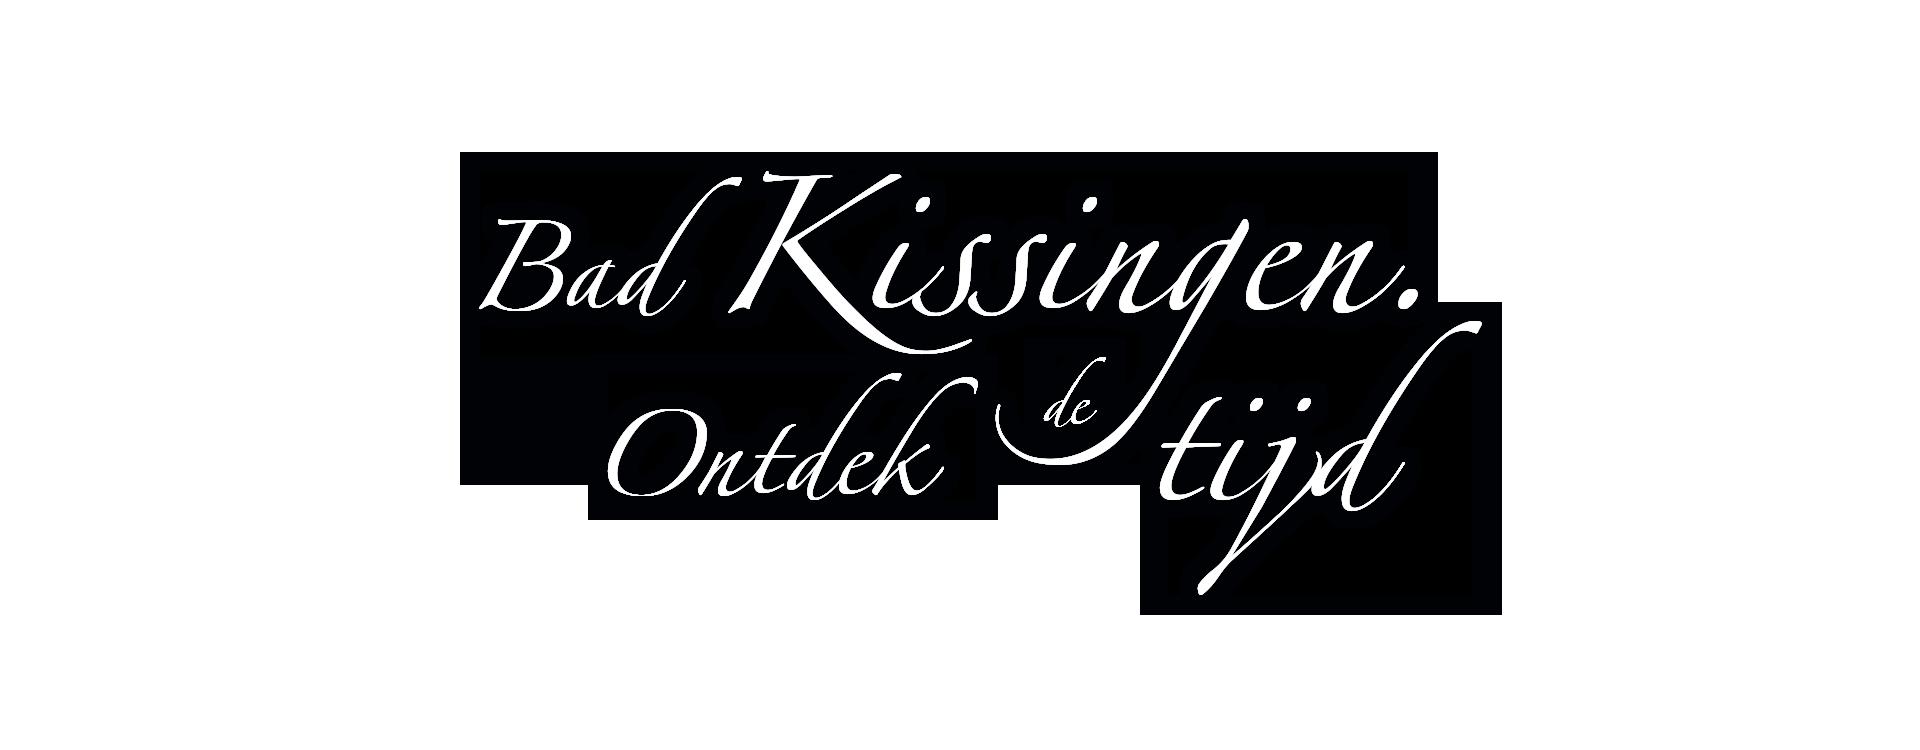 Claim Bad Kissingen 5